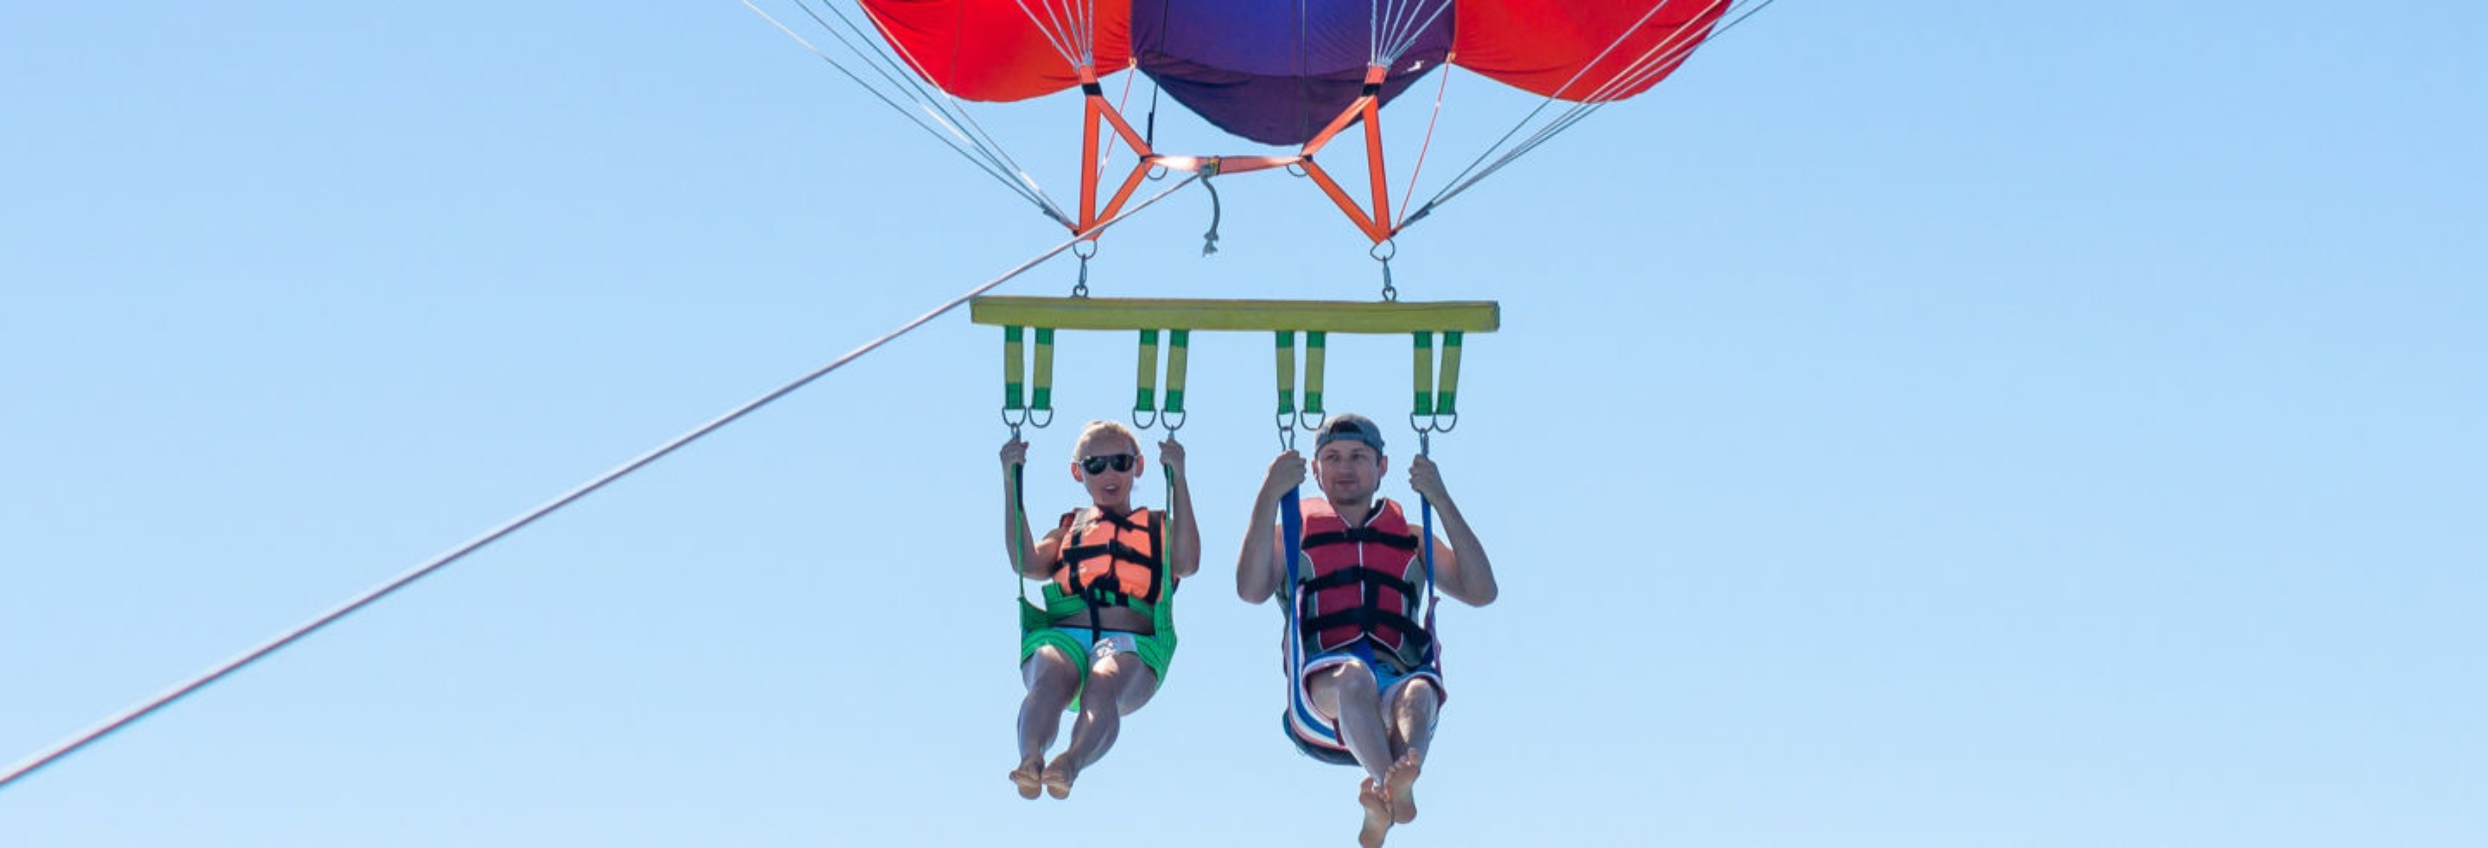 Parasailing en Playa Blanca